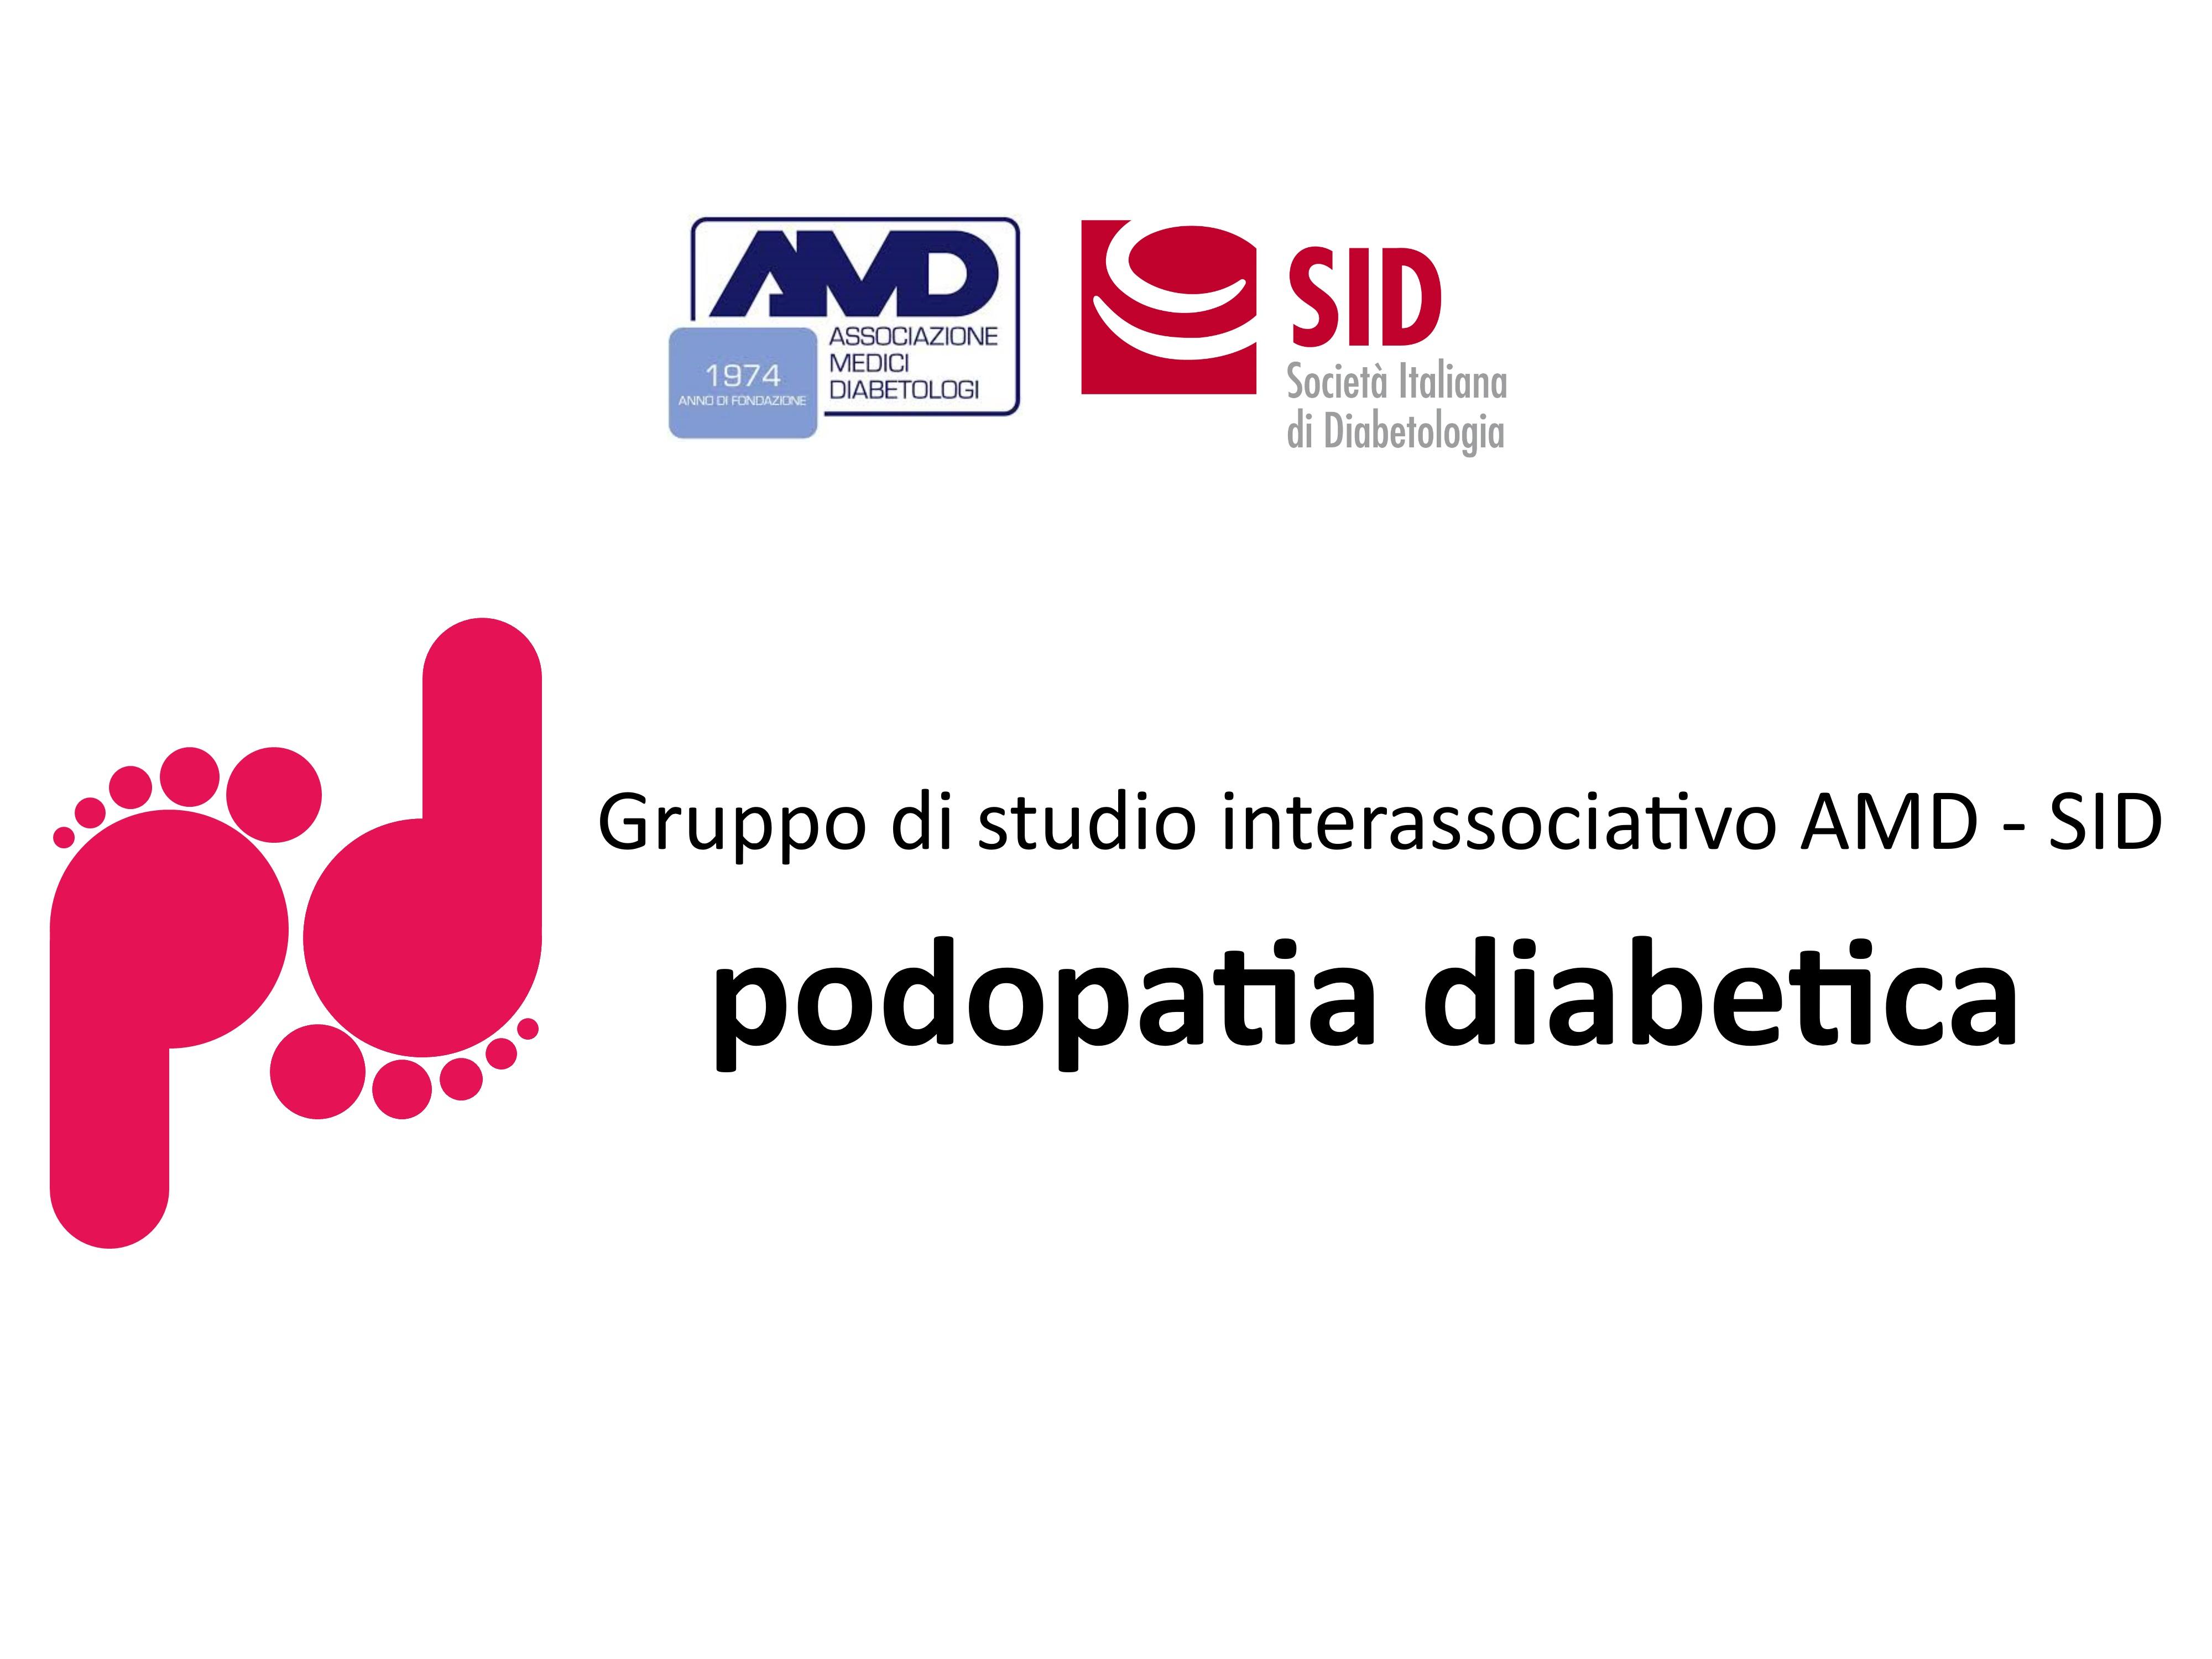 Podopatia Diabetica evidenza